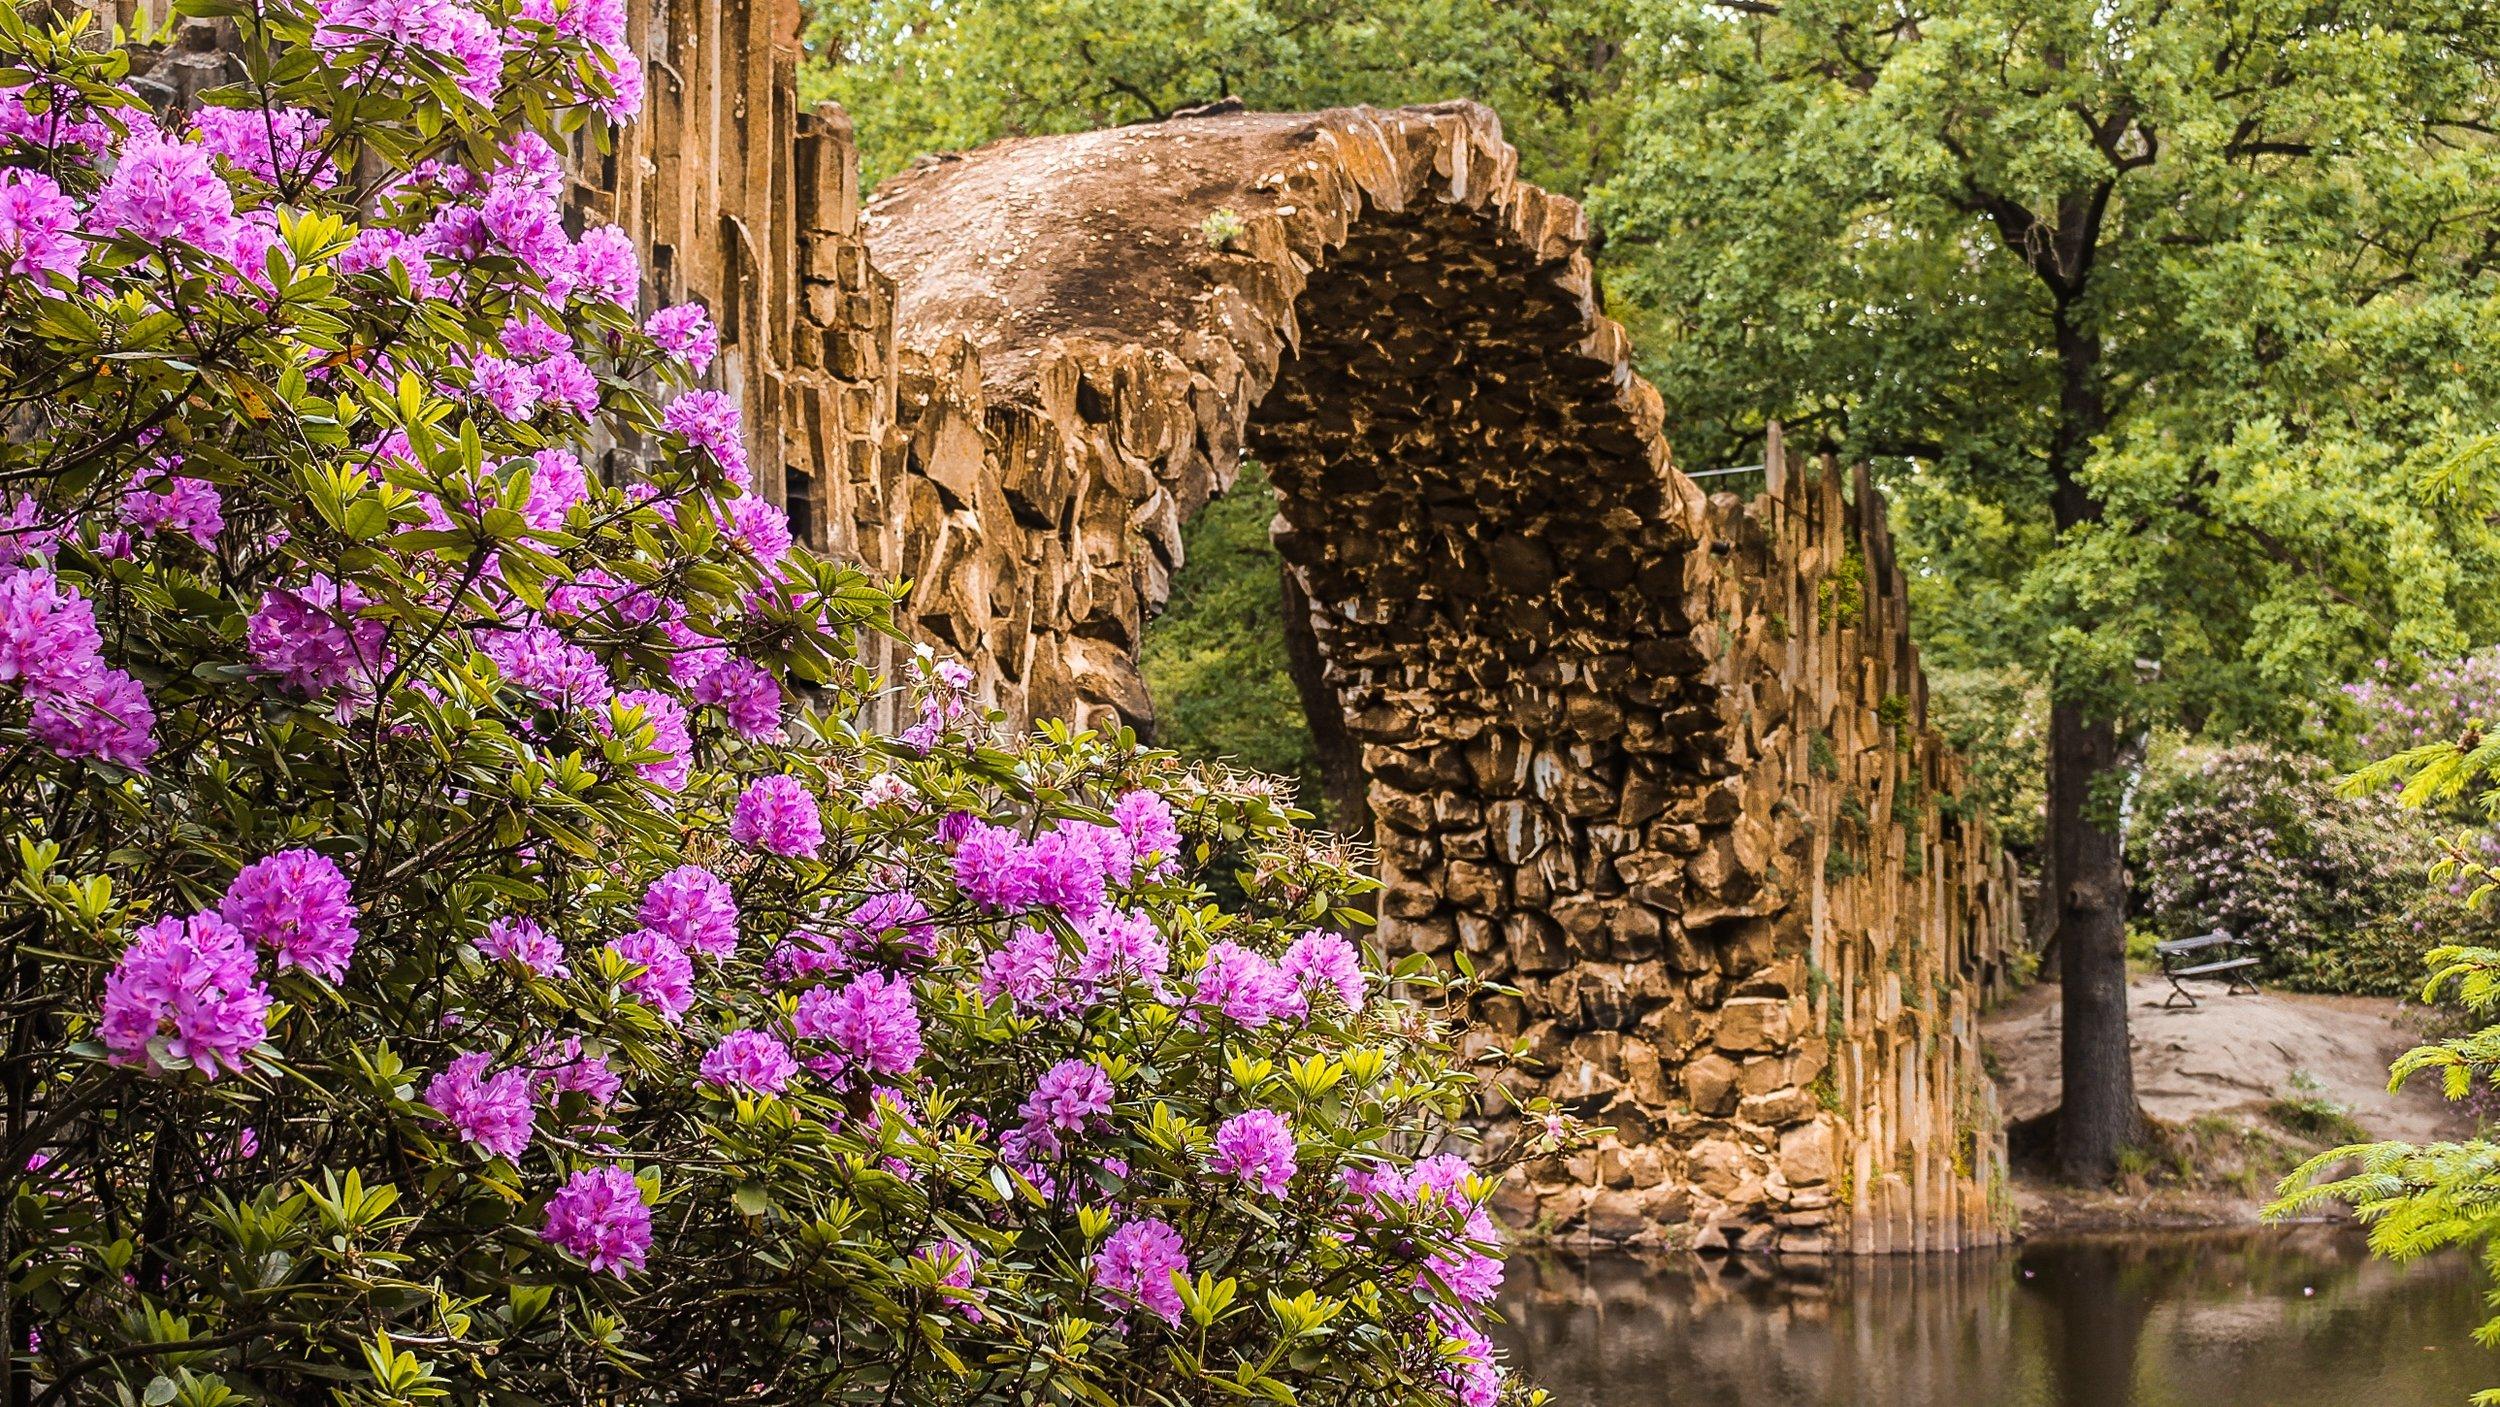 rhododendron-bridge-2887354.jpg